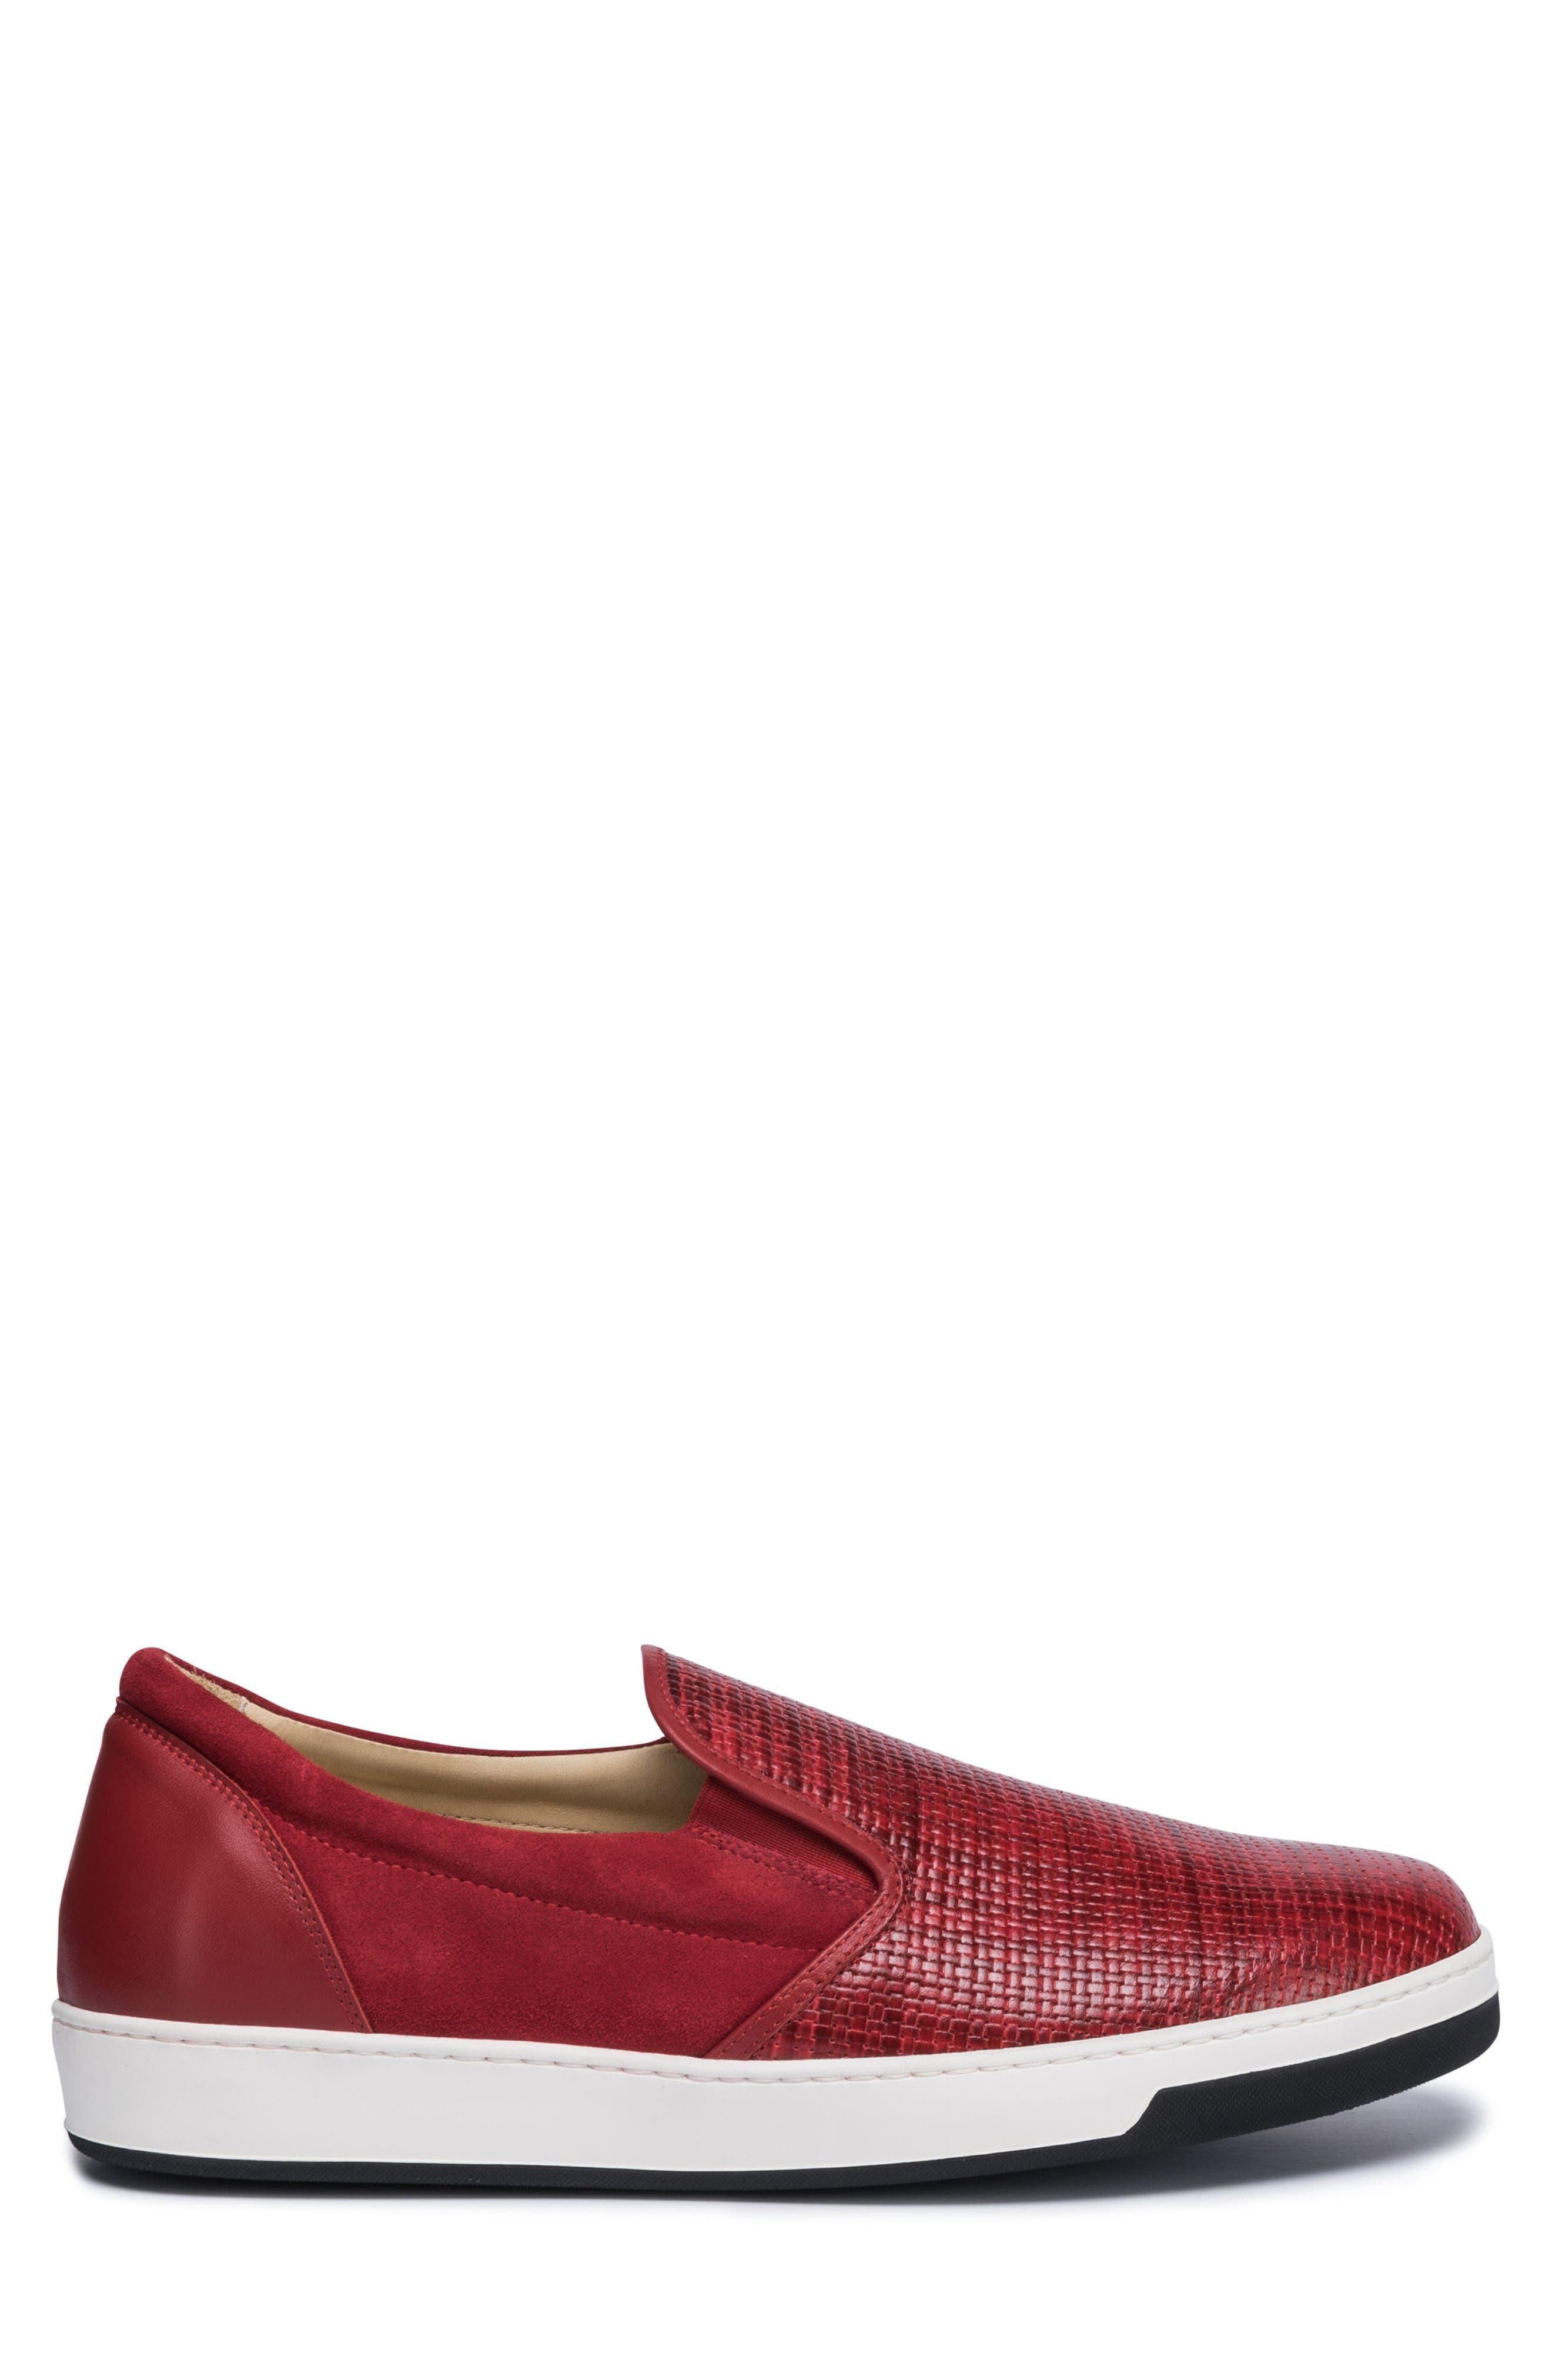 Cinque Terre Woven Slip-On Sneaker,                             Alternate thumbnail 9, color,